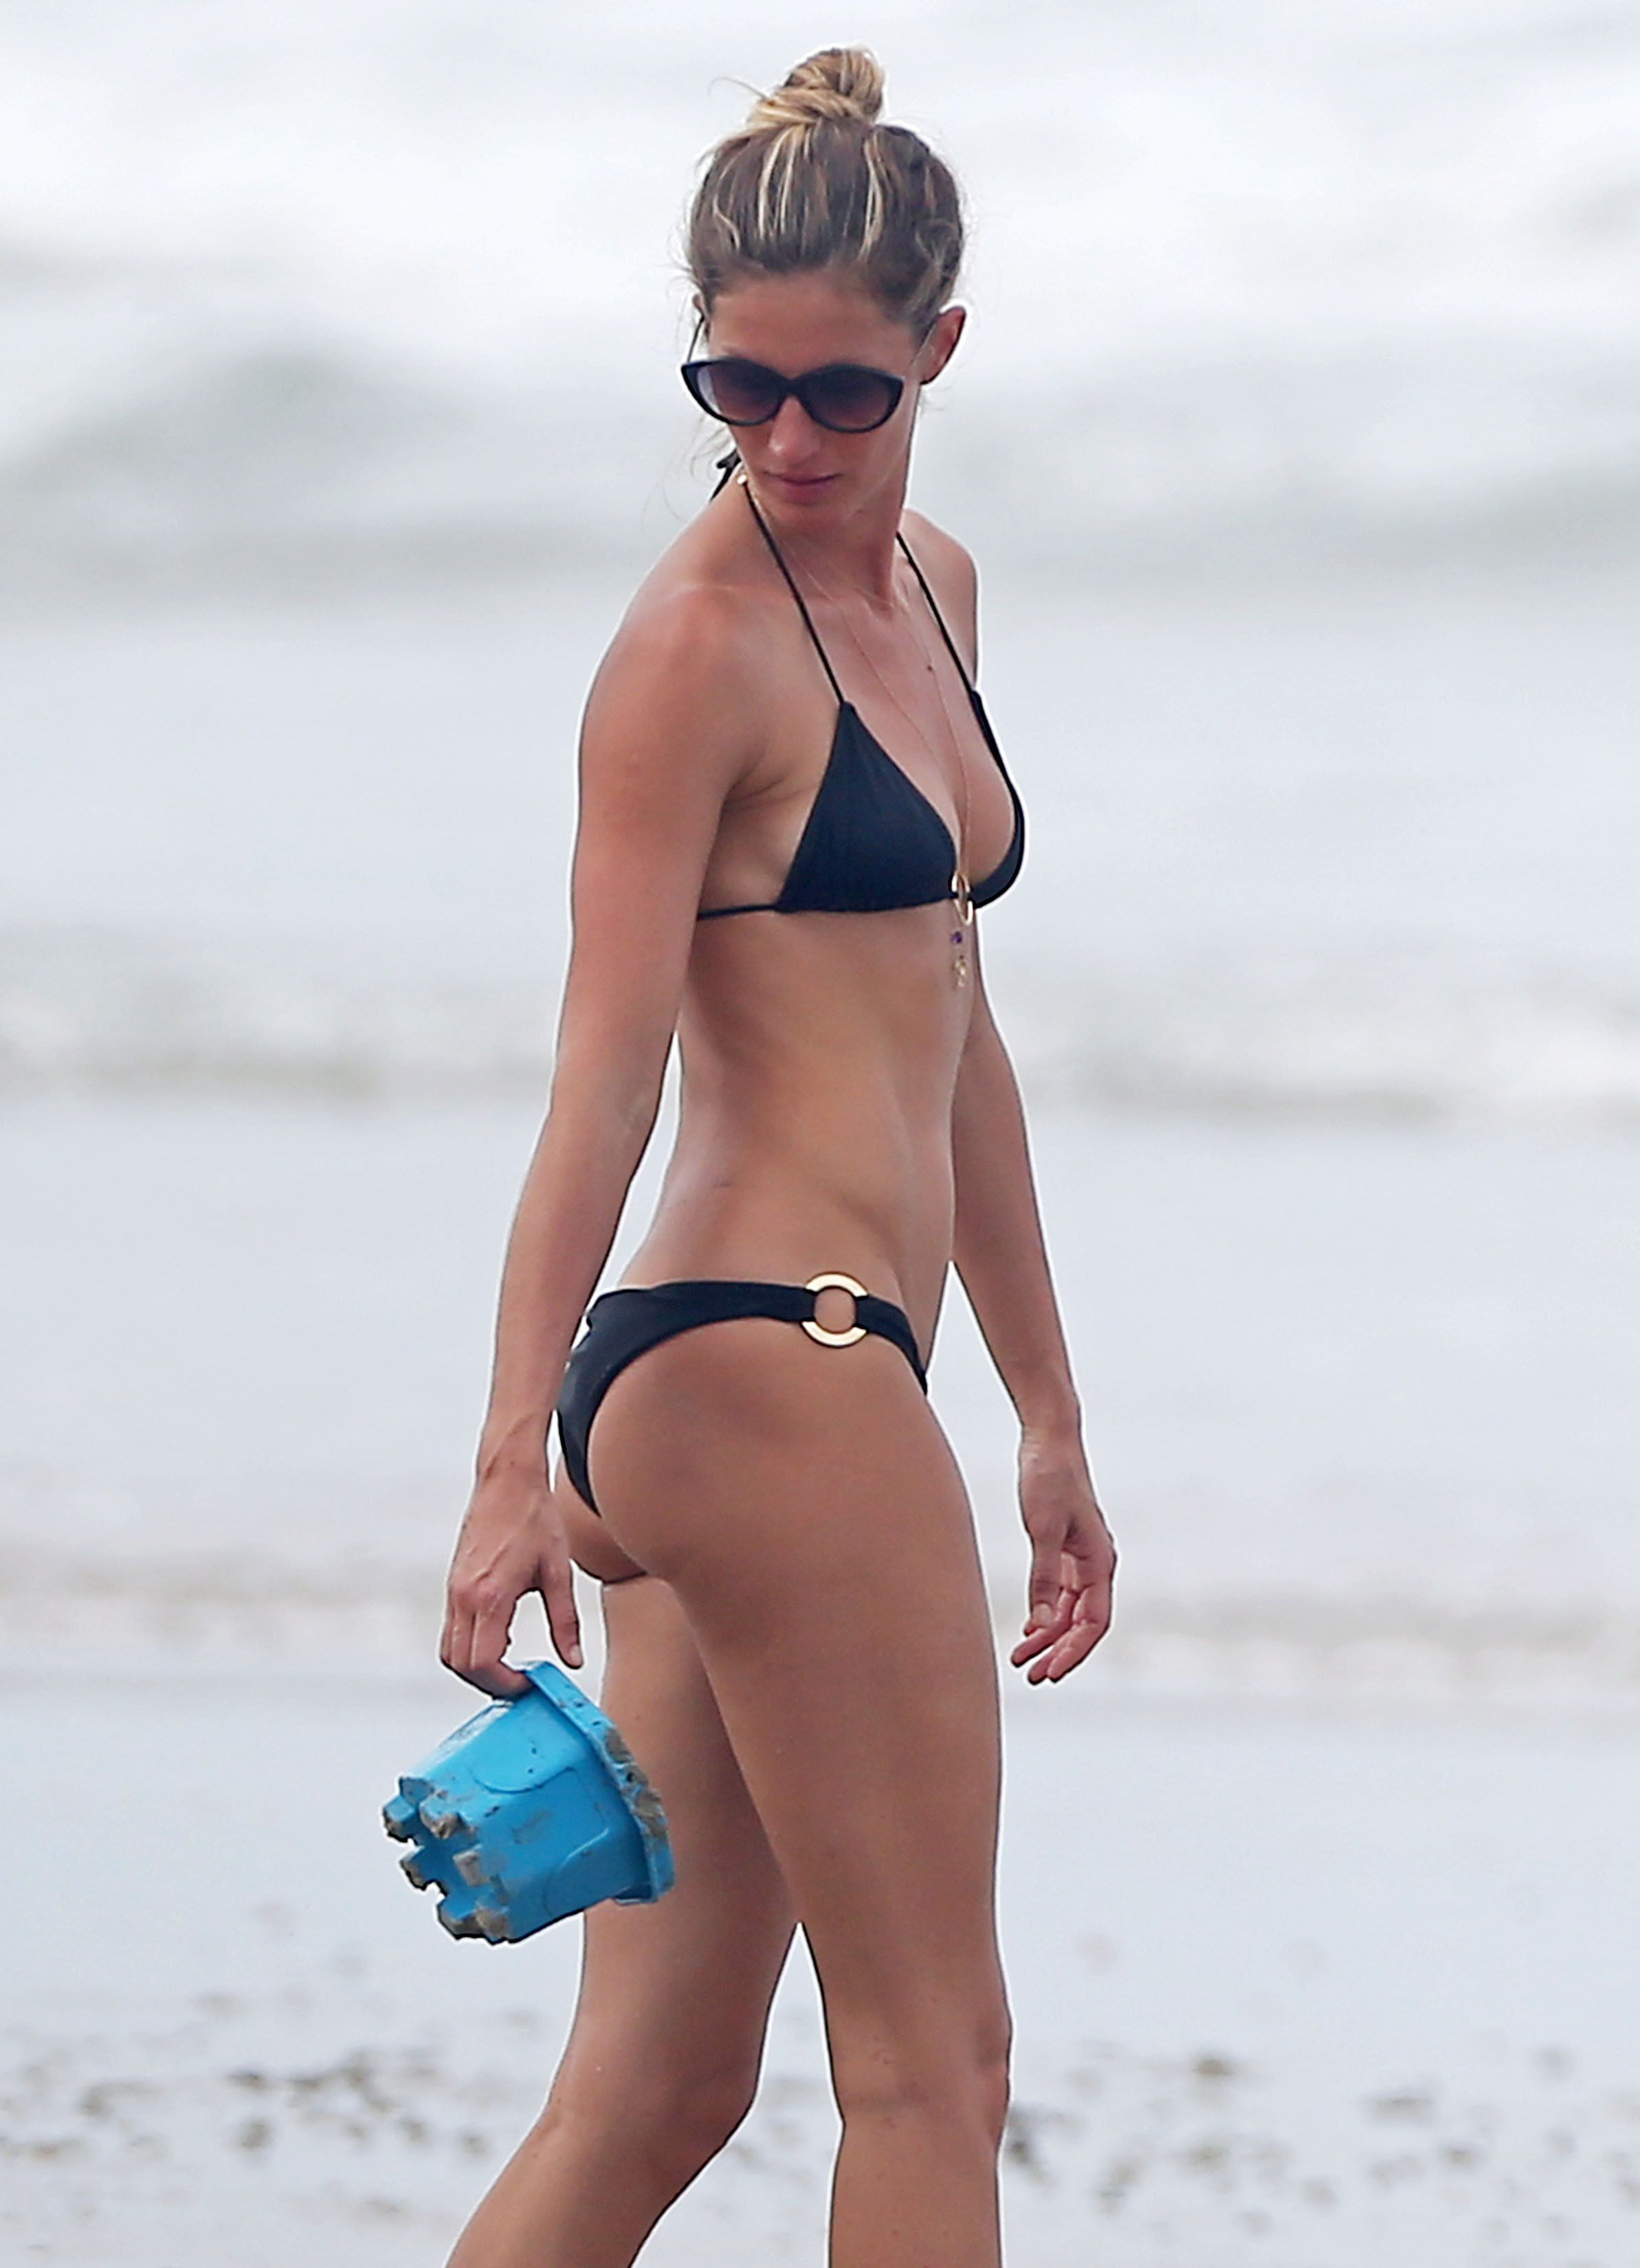 Resultado de imagen para giselle ponytail beach